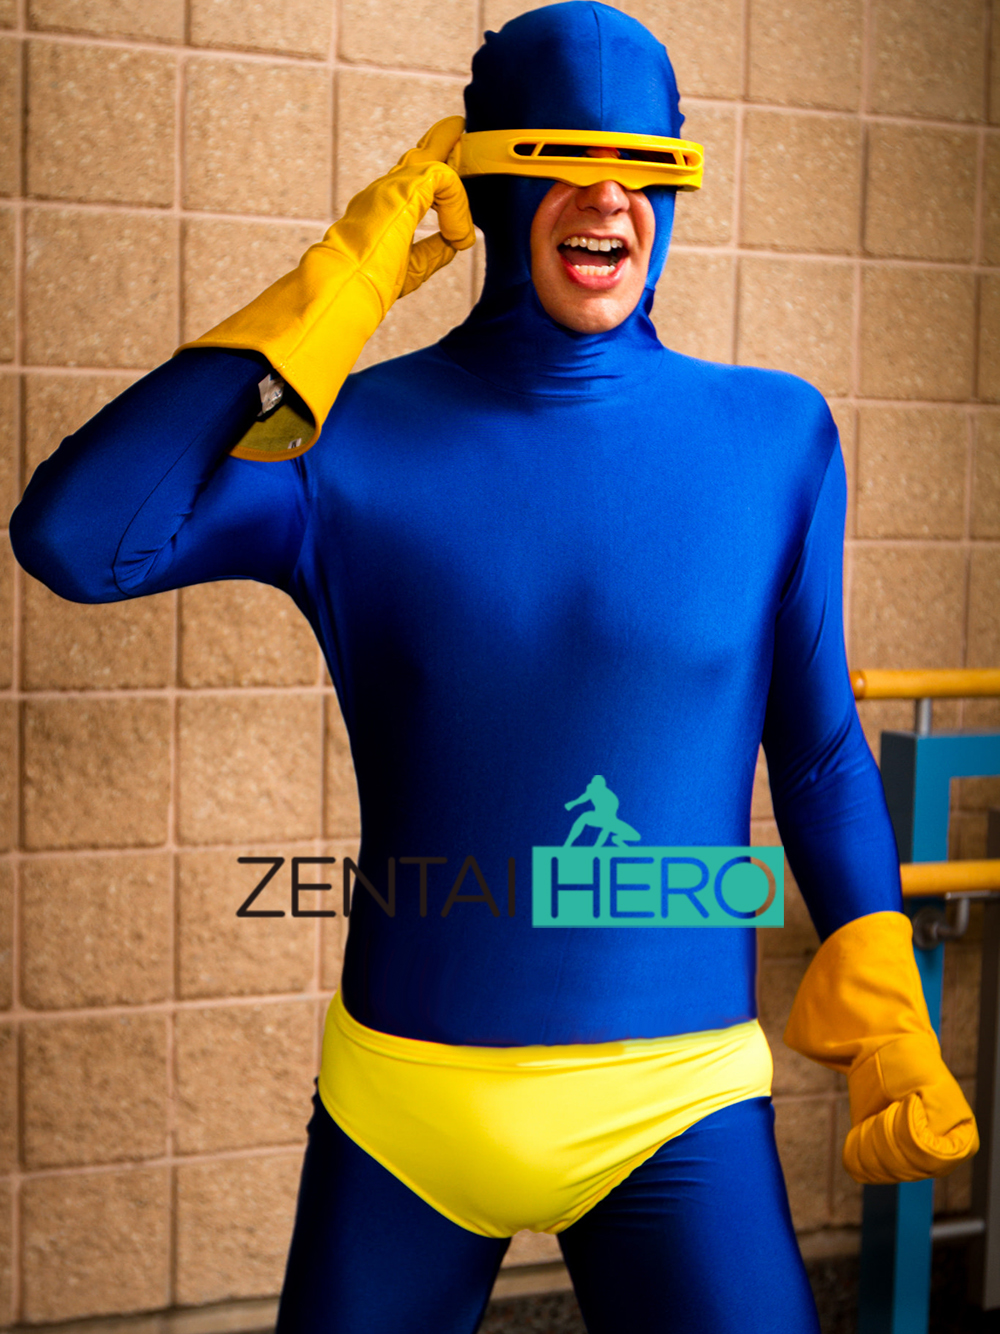 free shipping dhl 2017 adult x men cyclops costume superhero costume